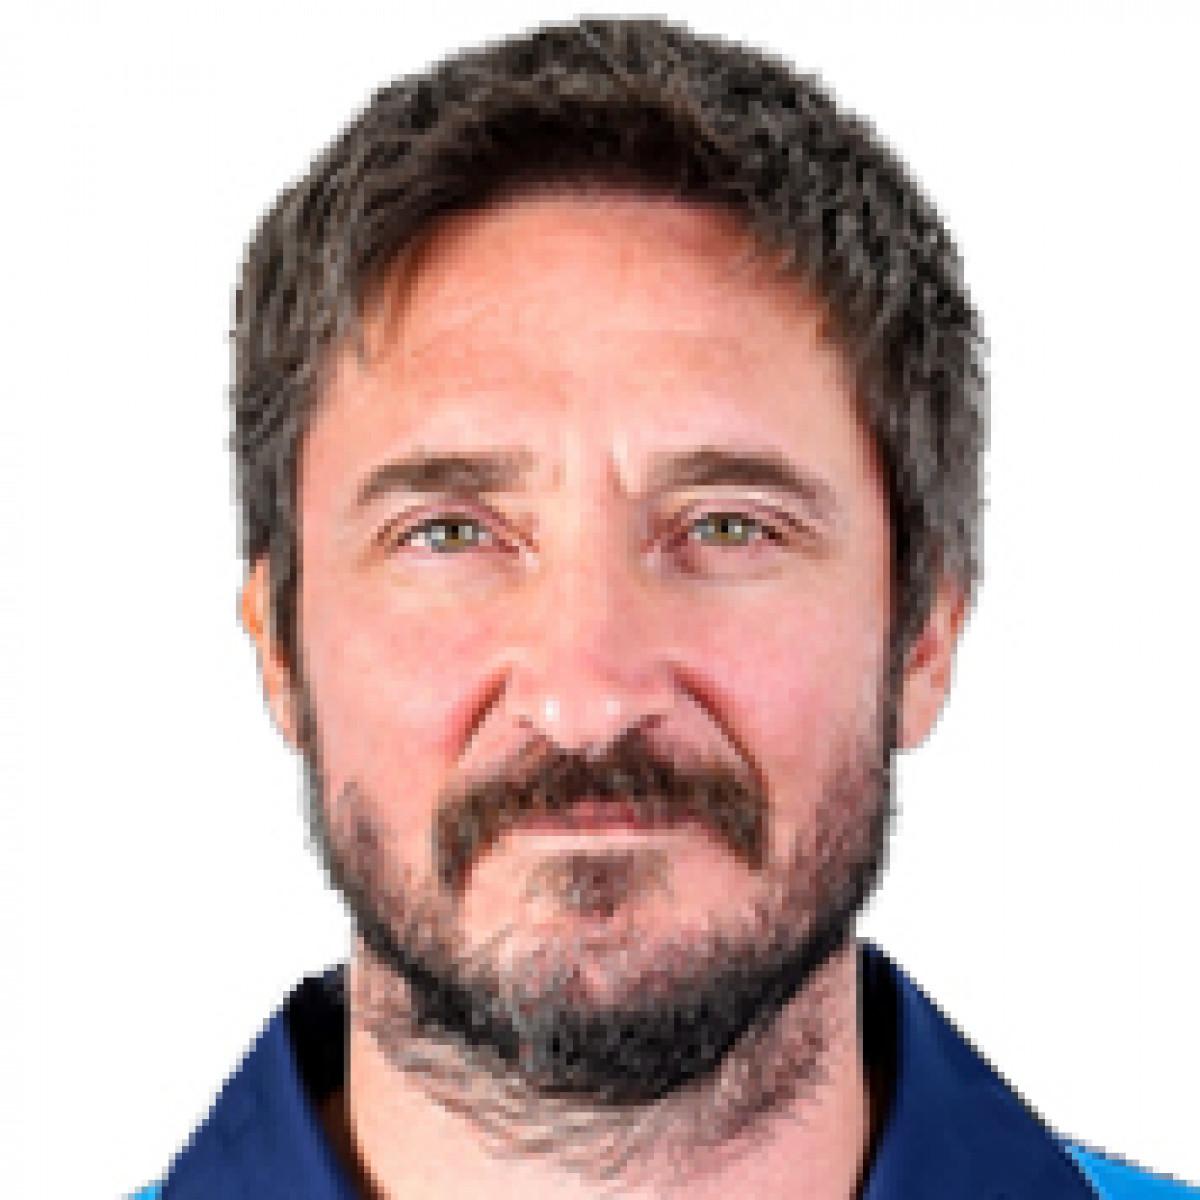 Gianmarco Pozzecco